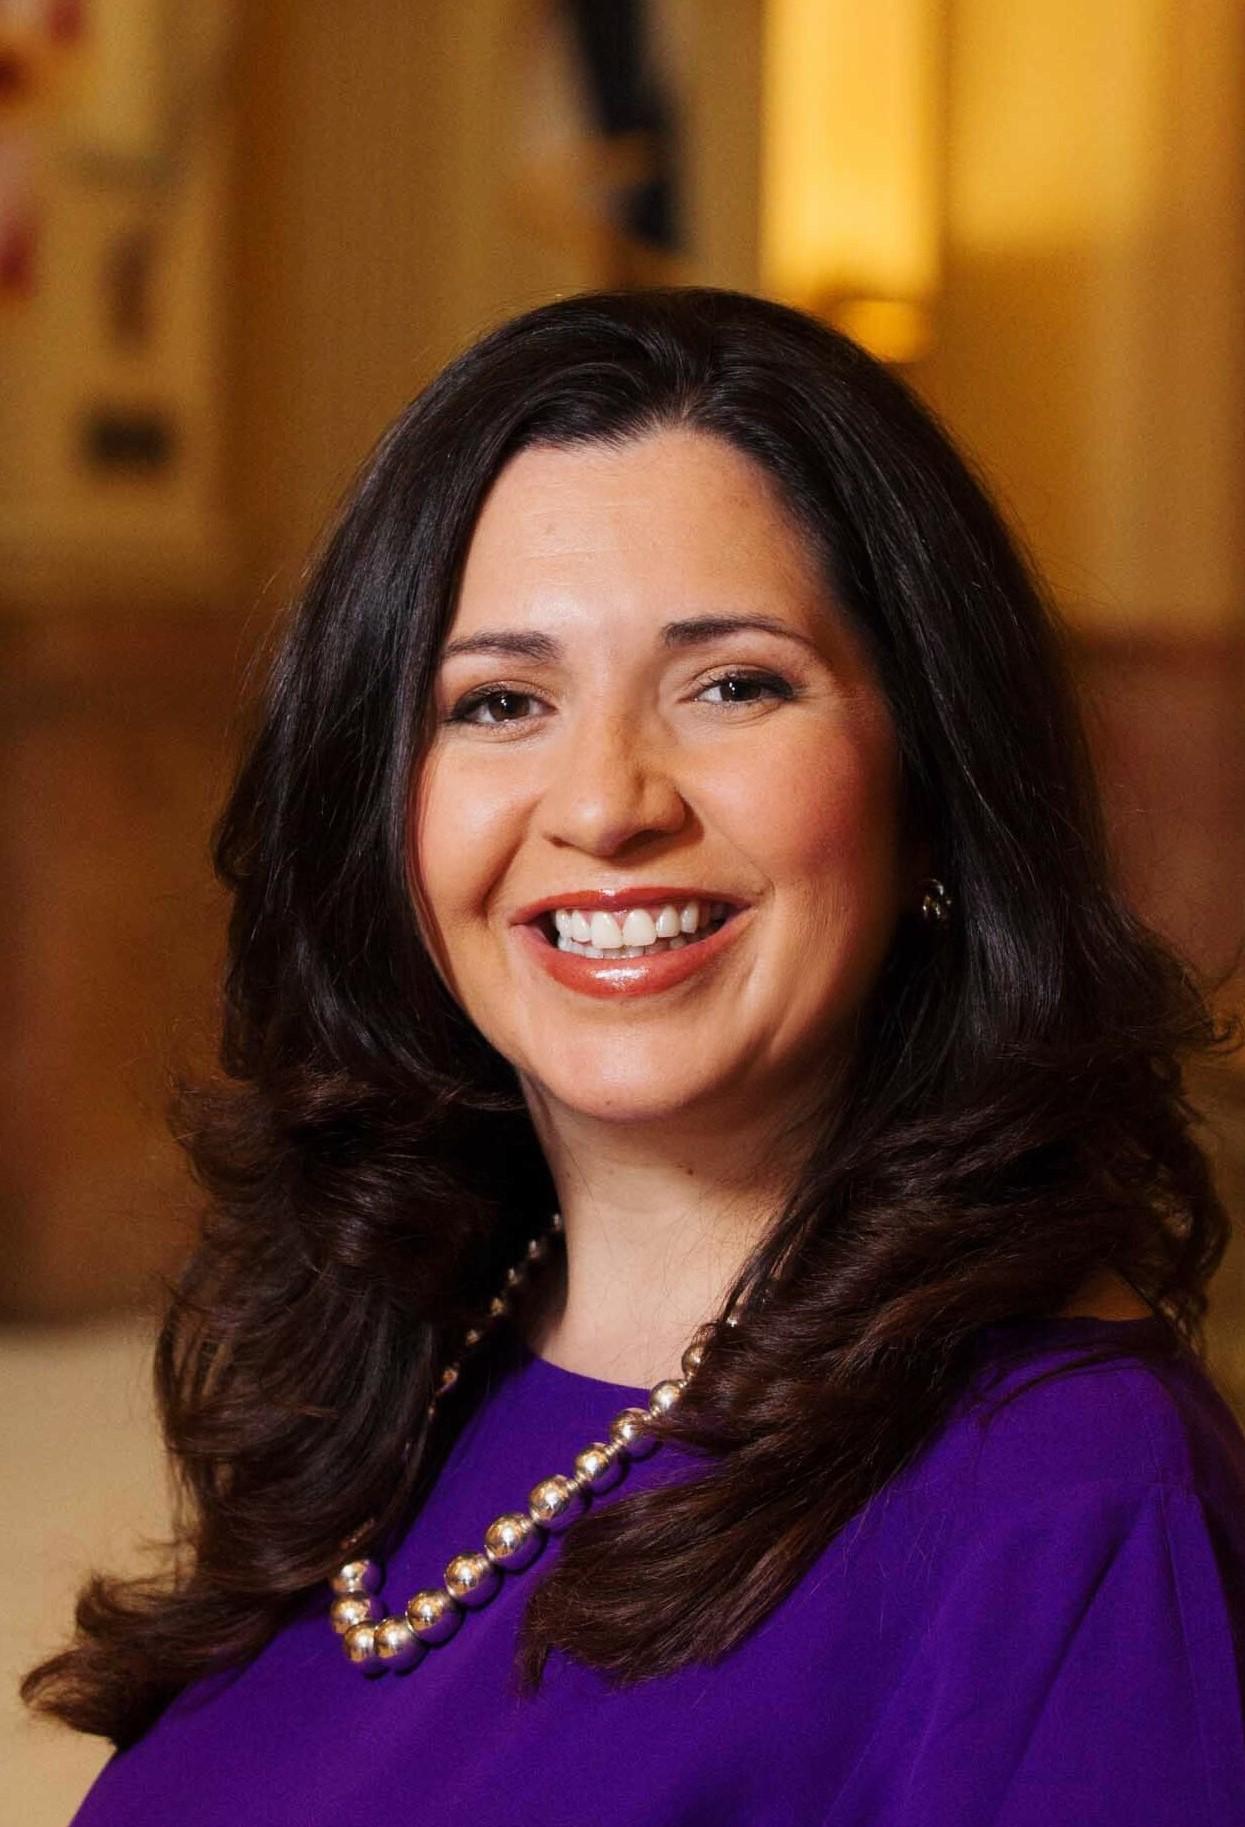 State Representative Crisanta Duran, CO